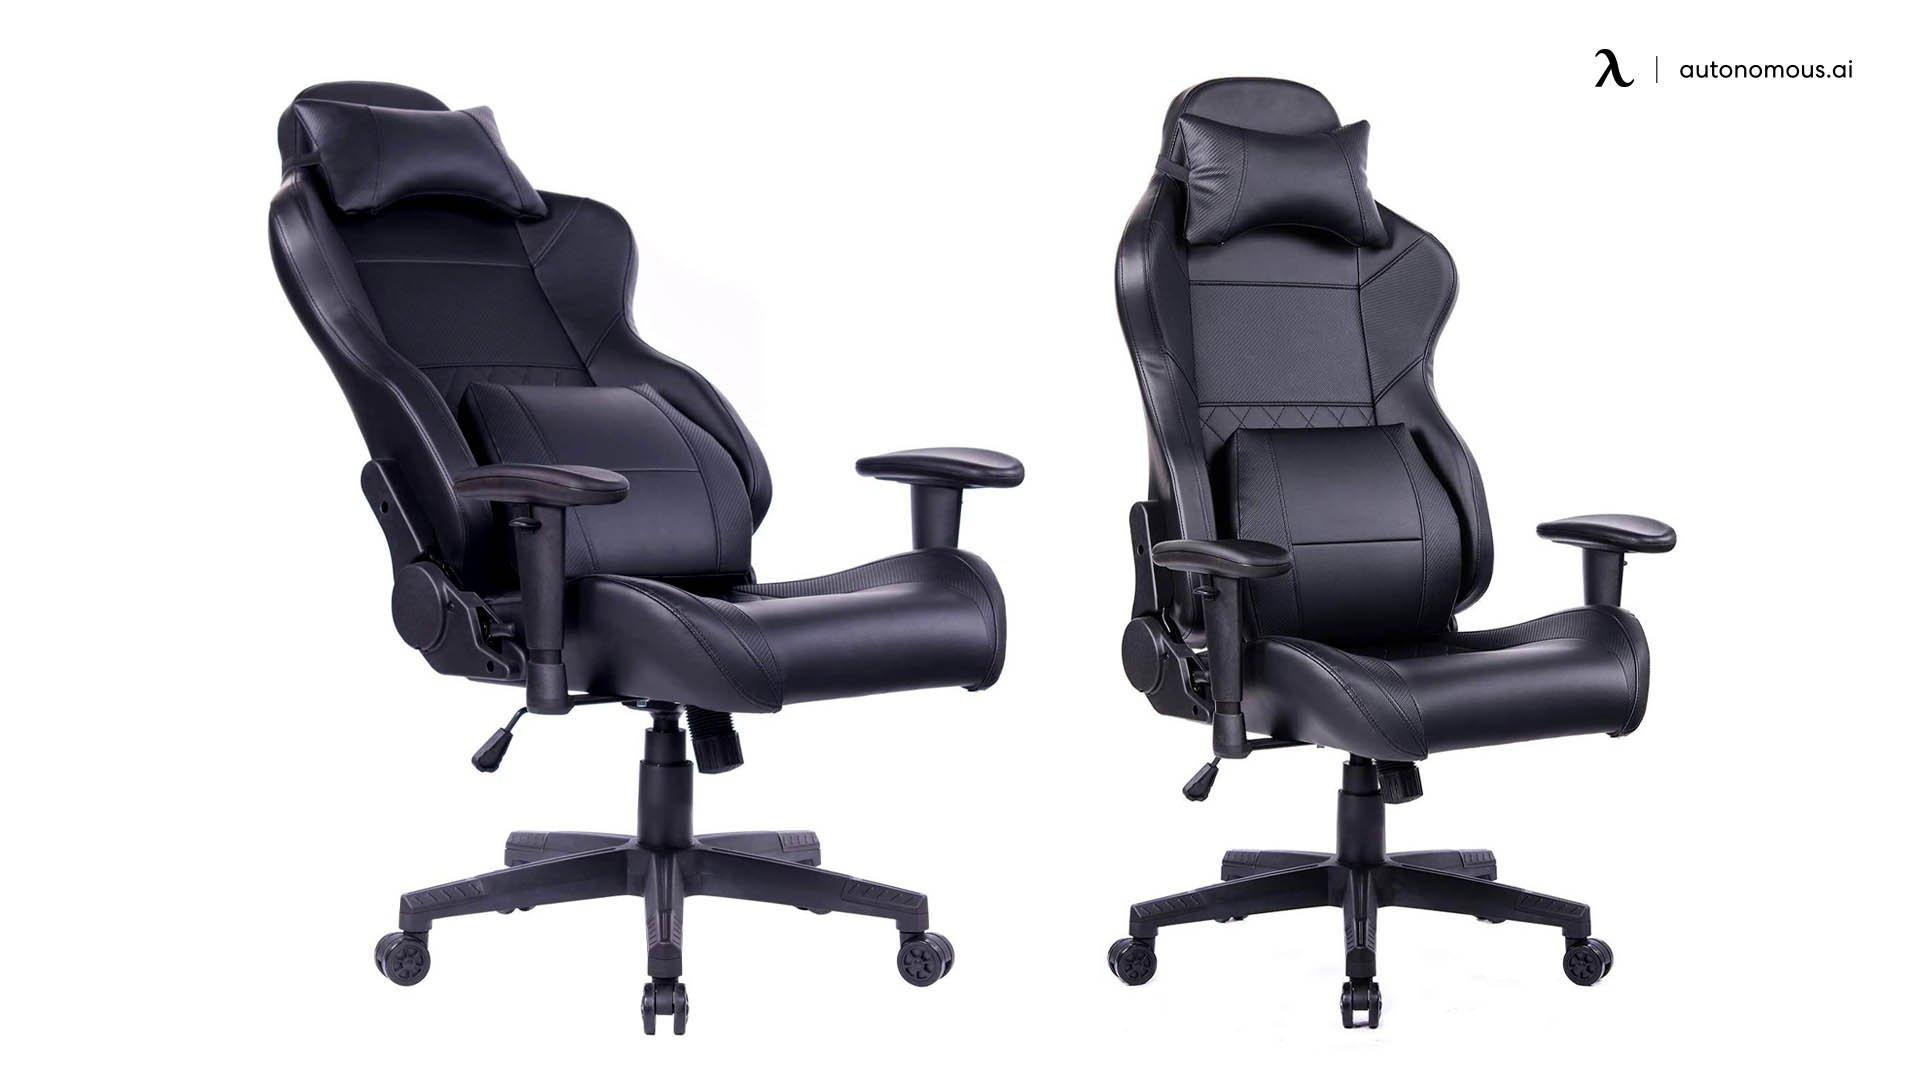 Reclining Gaming Chair by Healgen